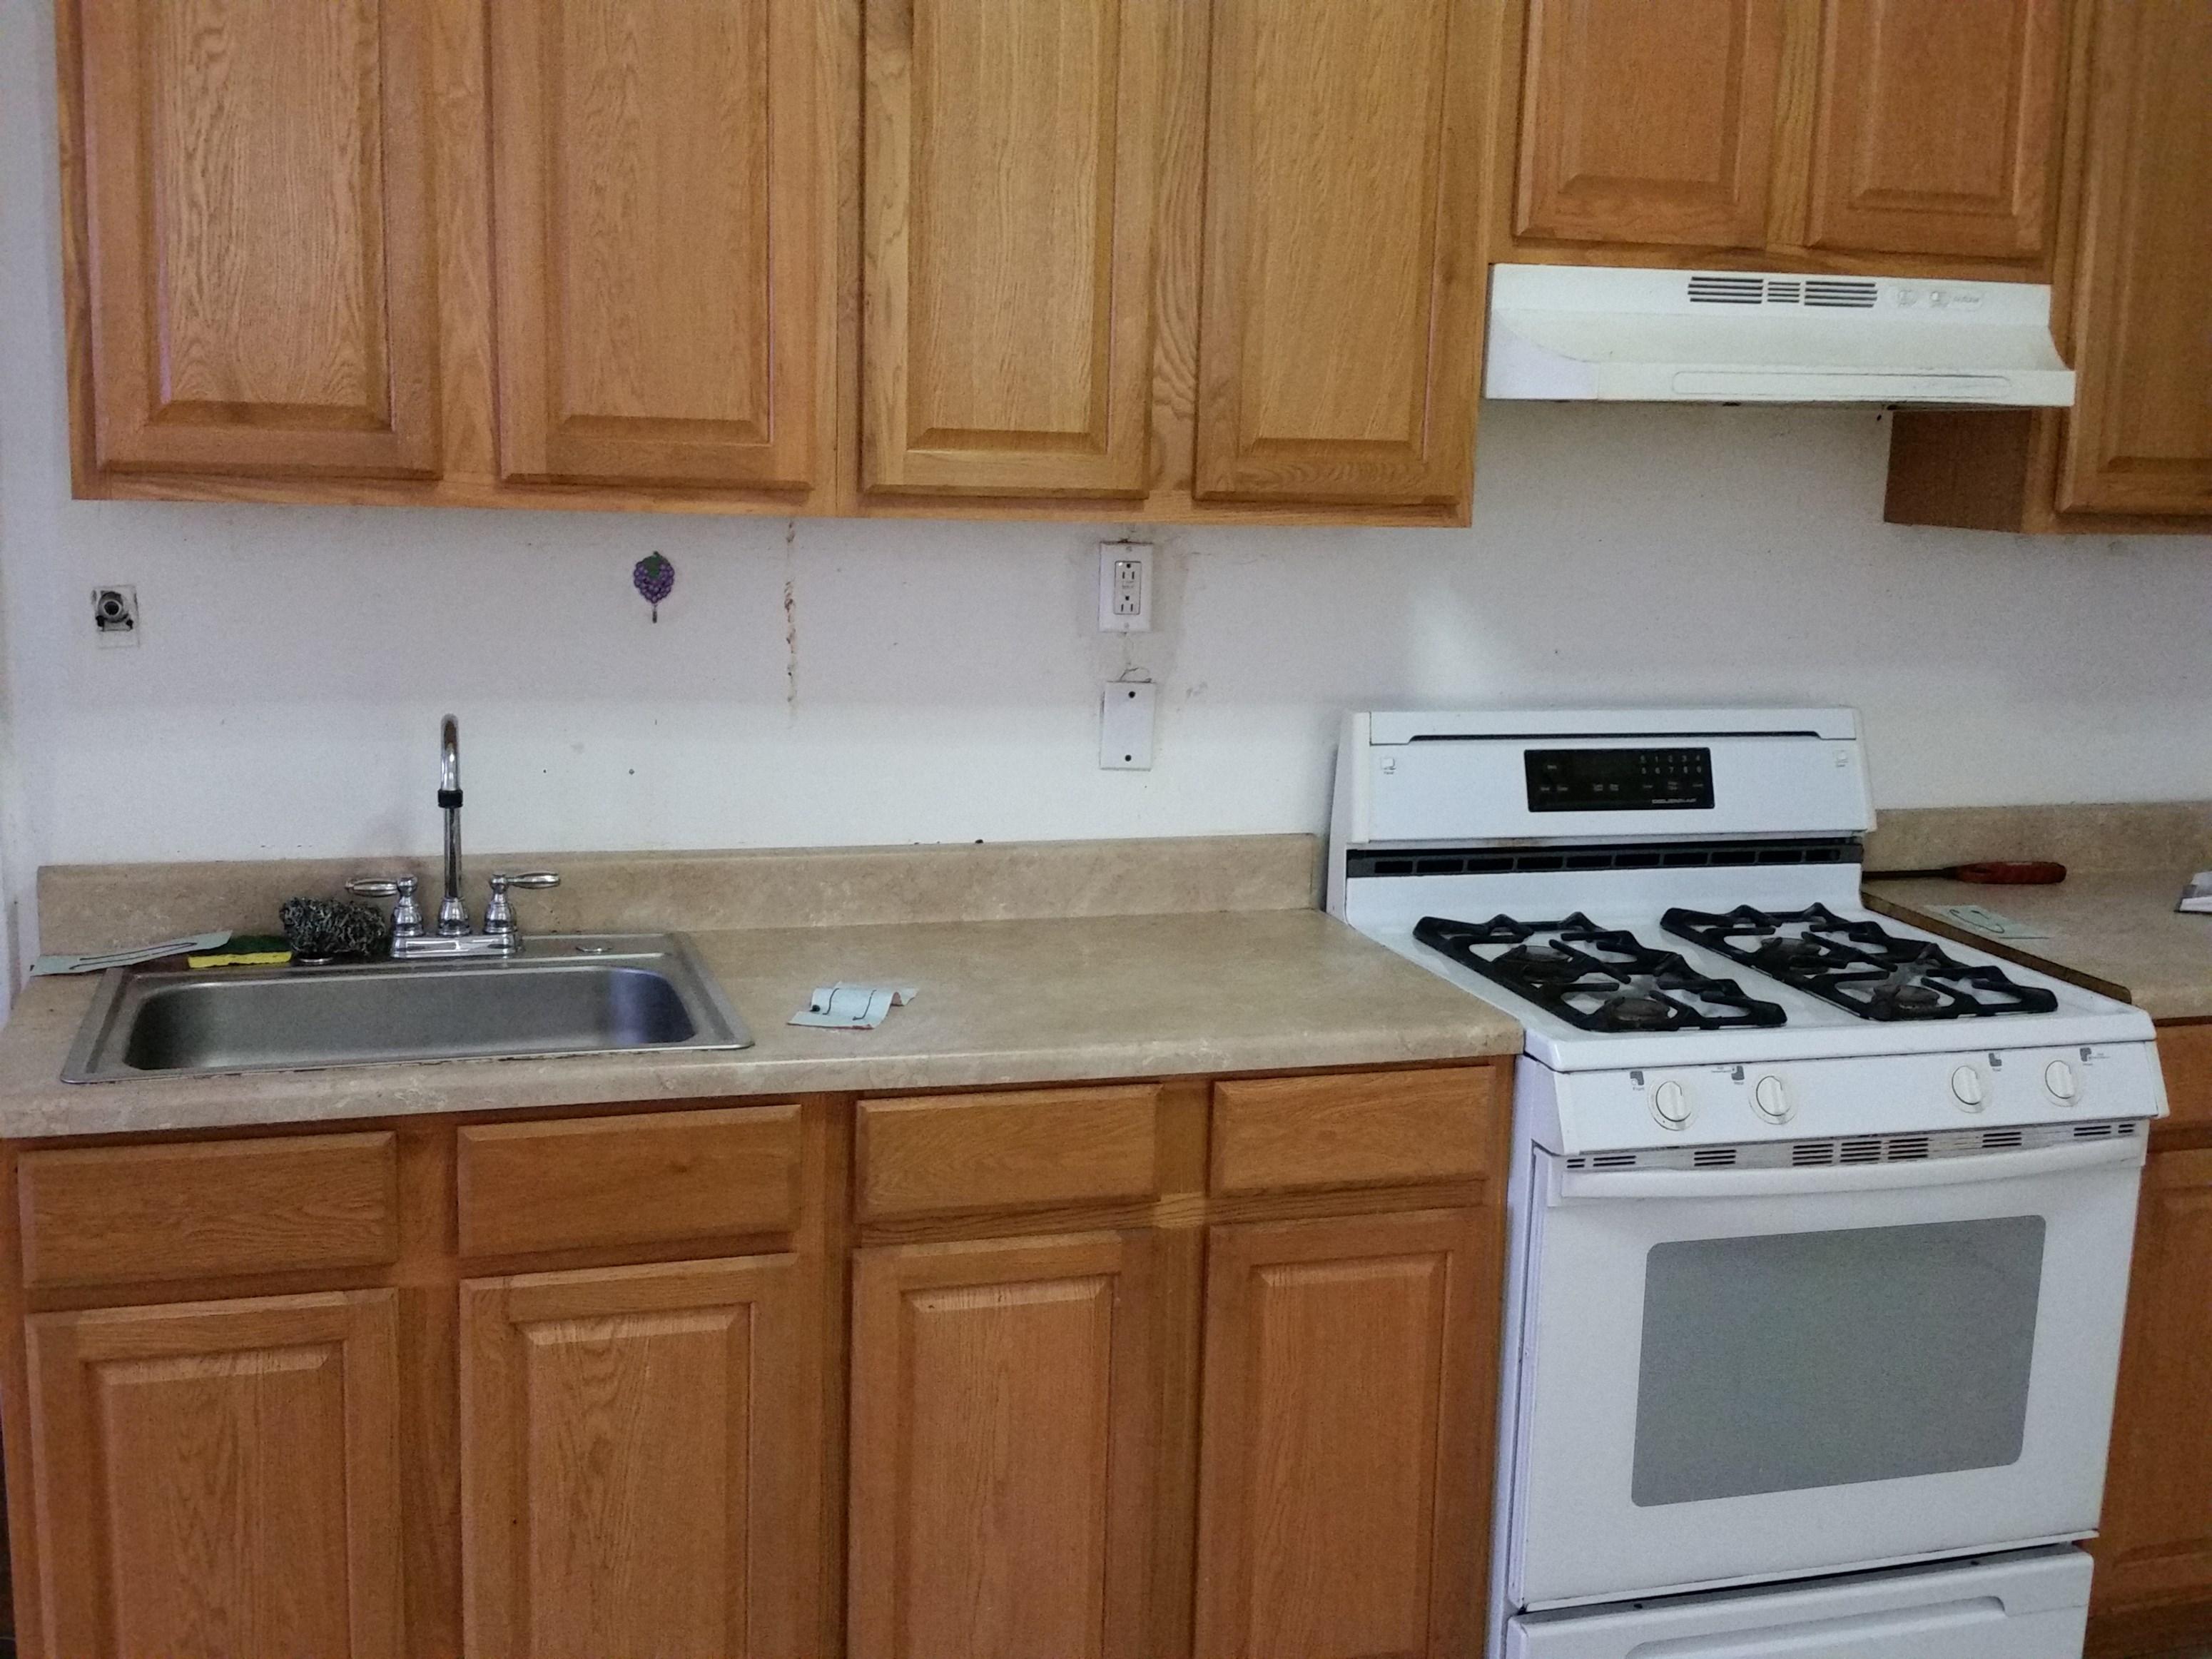 3 Bedroom Houses For Rent In Nj | 2 Bedroom Apartment To Rent In Jersey City Nj Two Bedroom